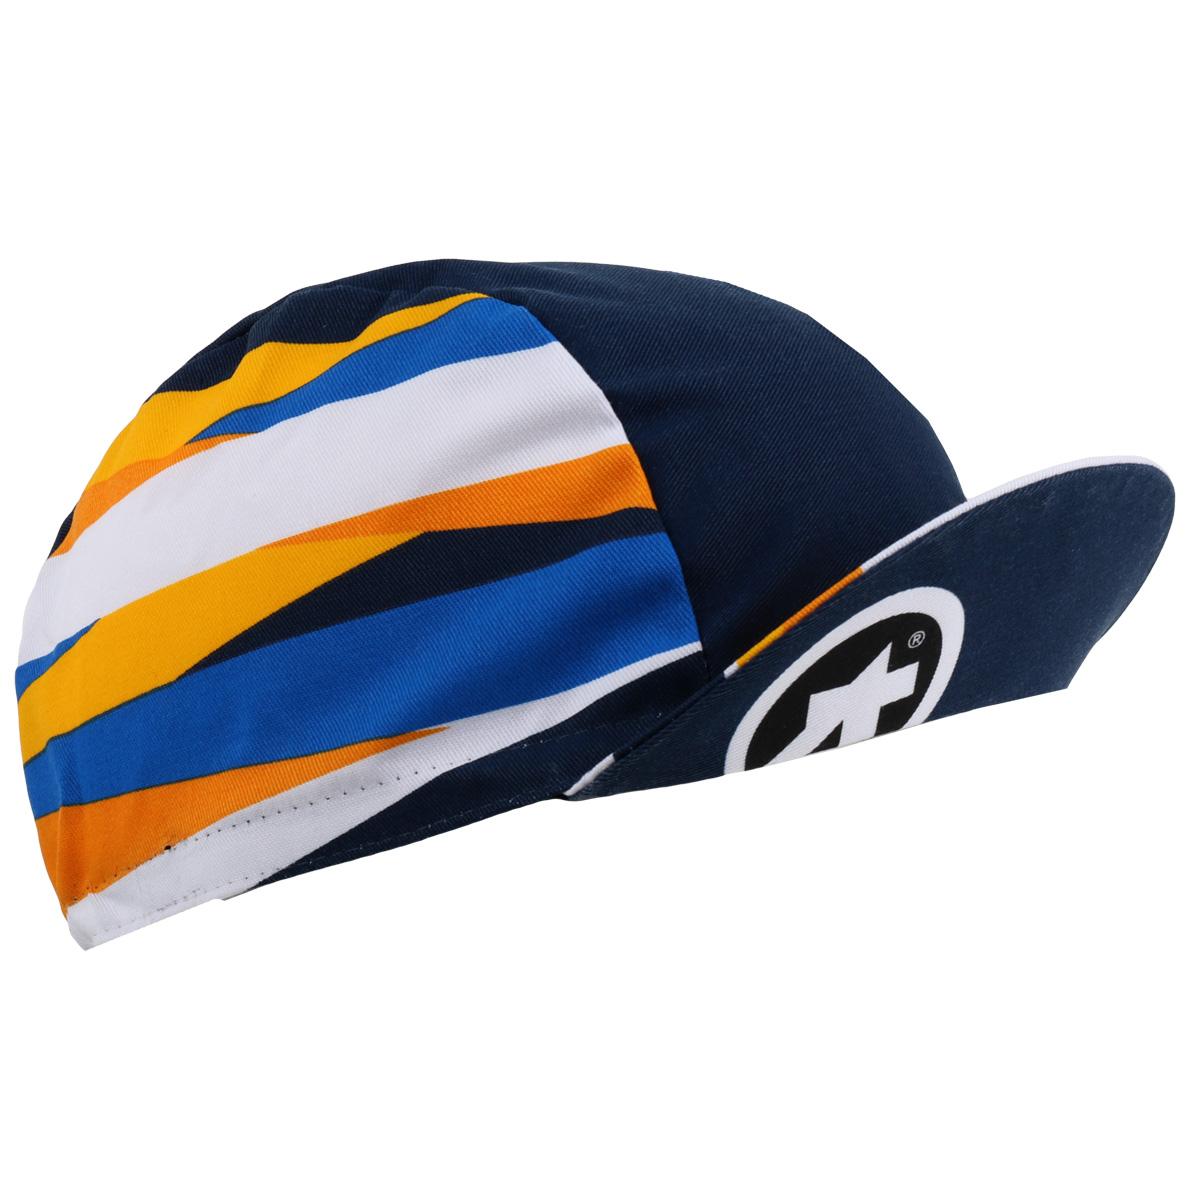 Image of Assos x BIKE24 Edition Cycling Cap PCR.1 - blue